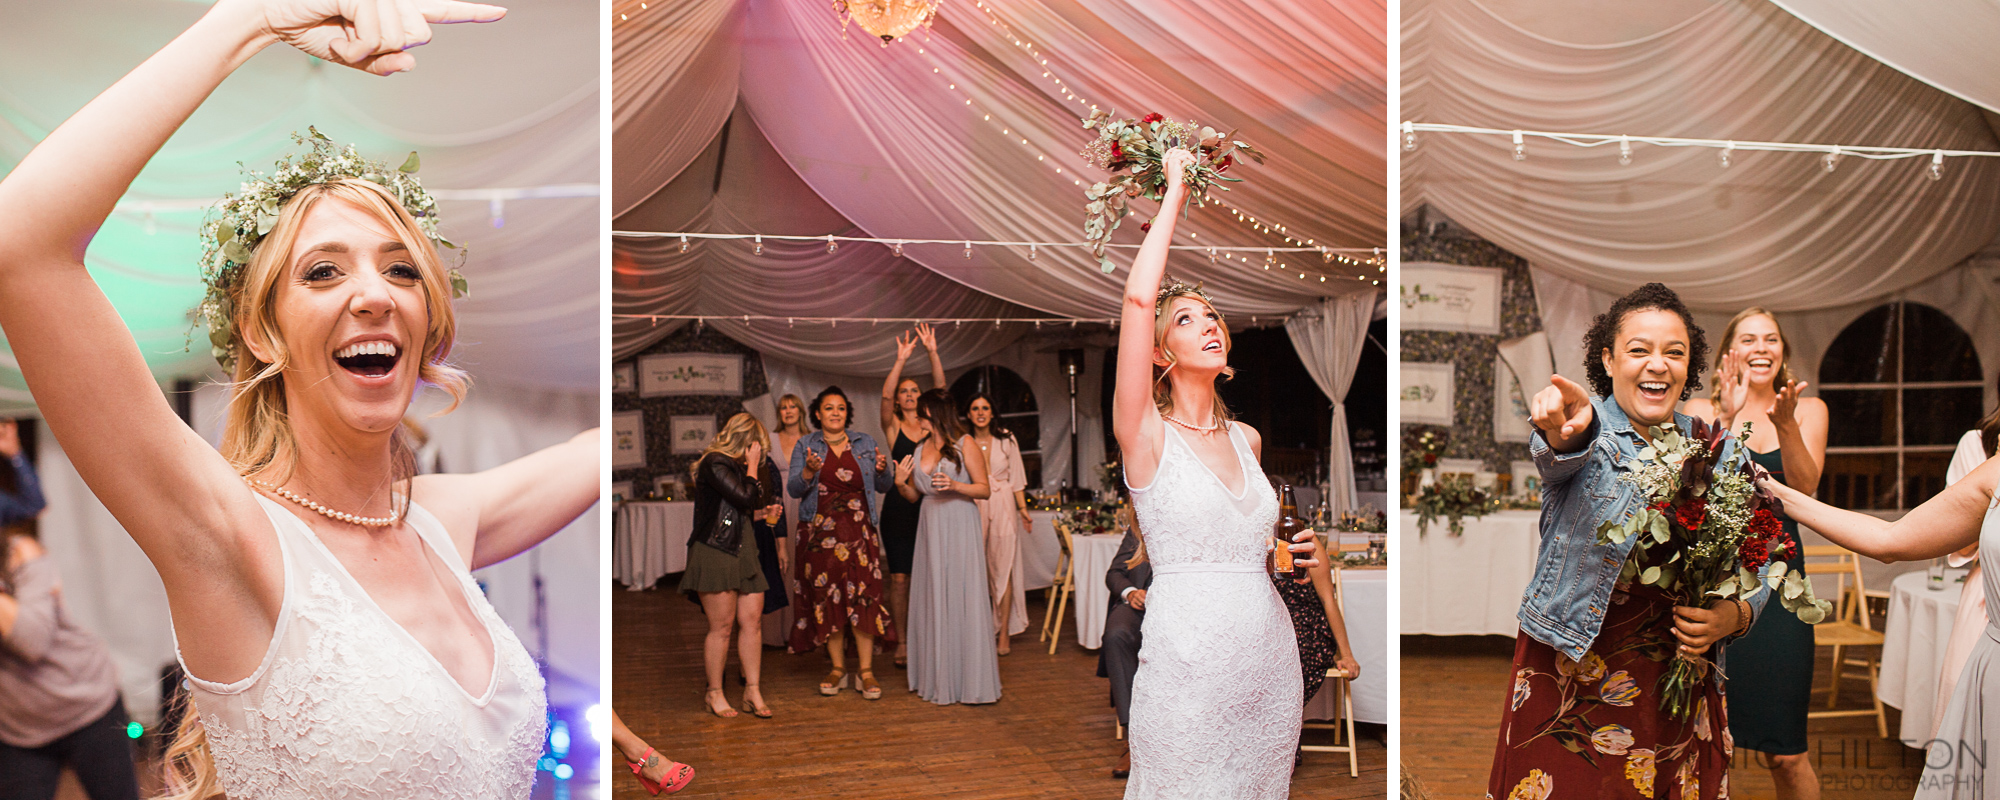 Bouquet-Toss-Double-Eagle-Wedding.jpg